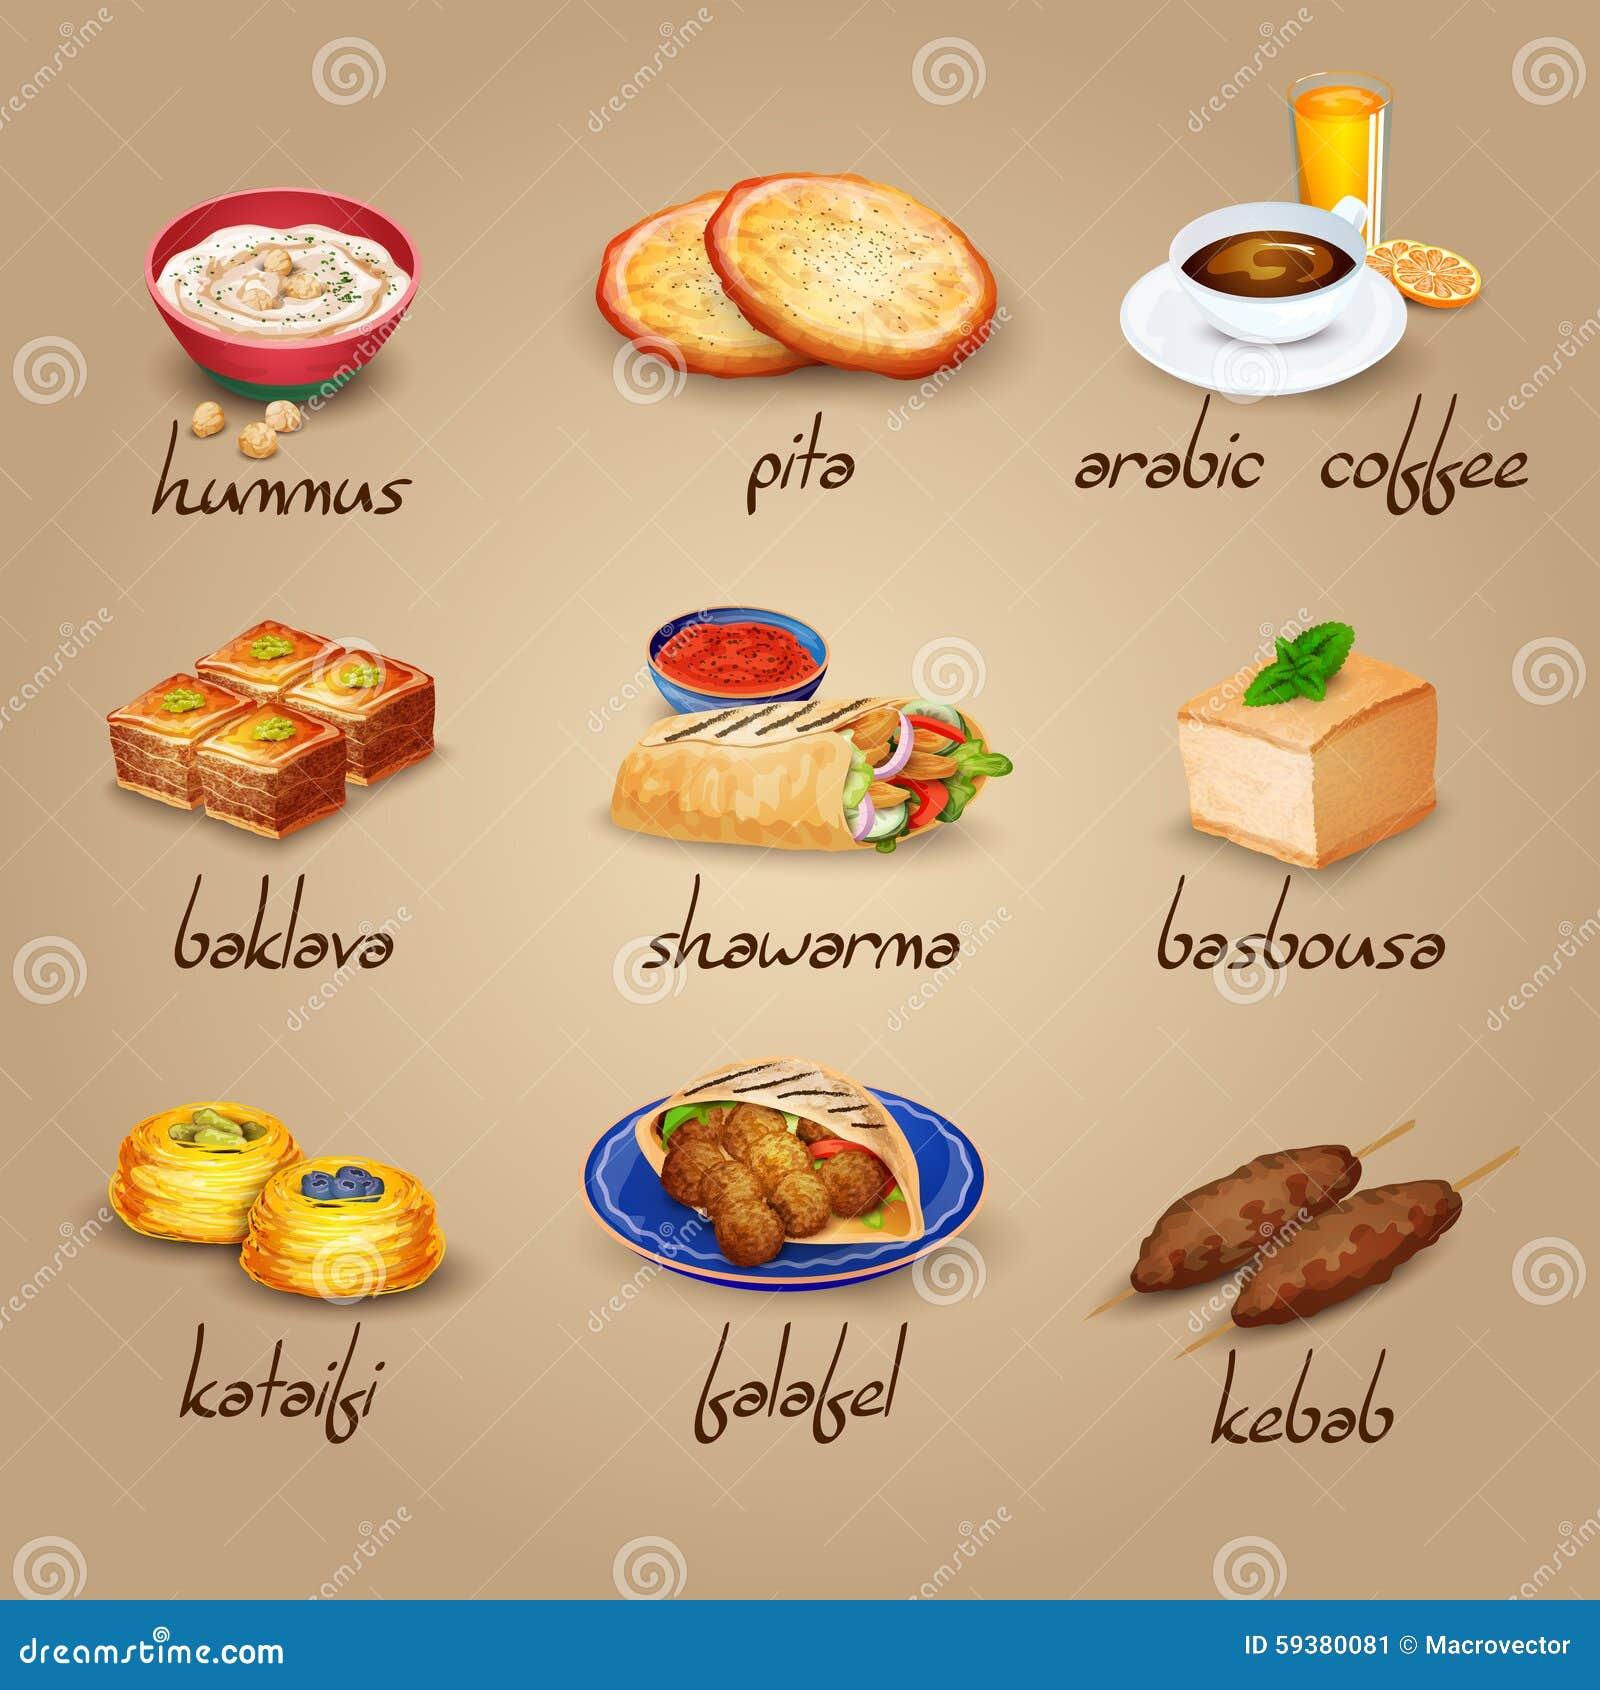 Arabische lebensmittel ikonen eingestellt vektor abbildung for Art de cuisine plates